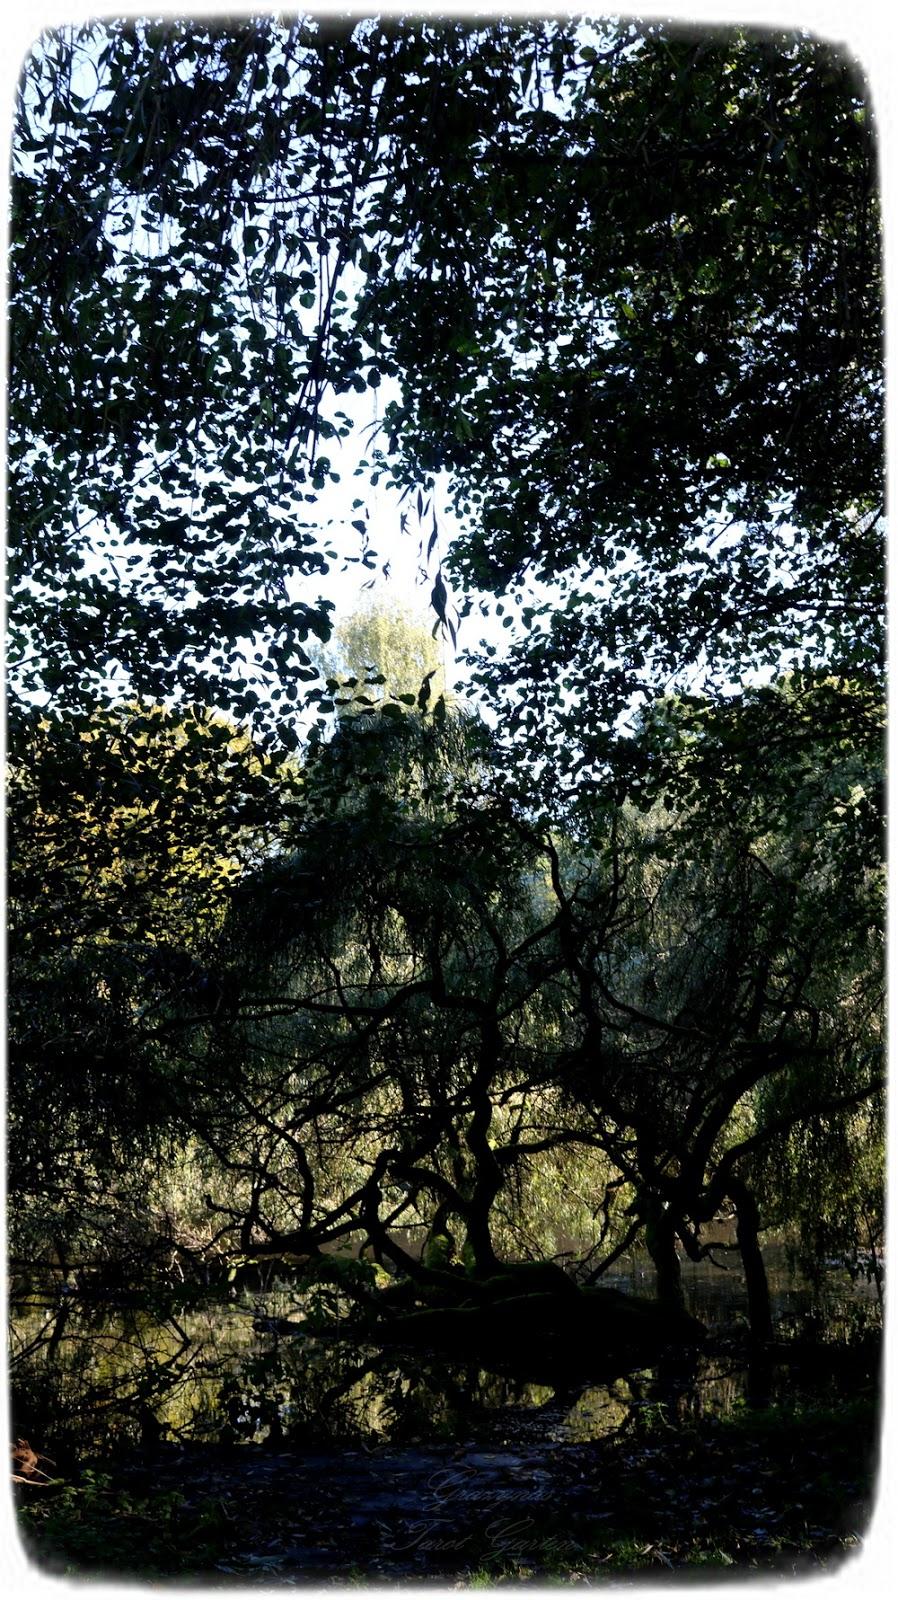 Herbst Tagundnachtgleiche, grazynastarotgarten.blogspot.com